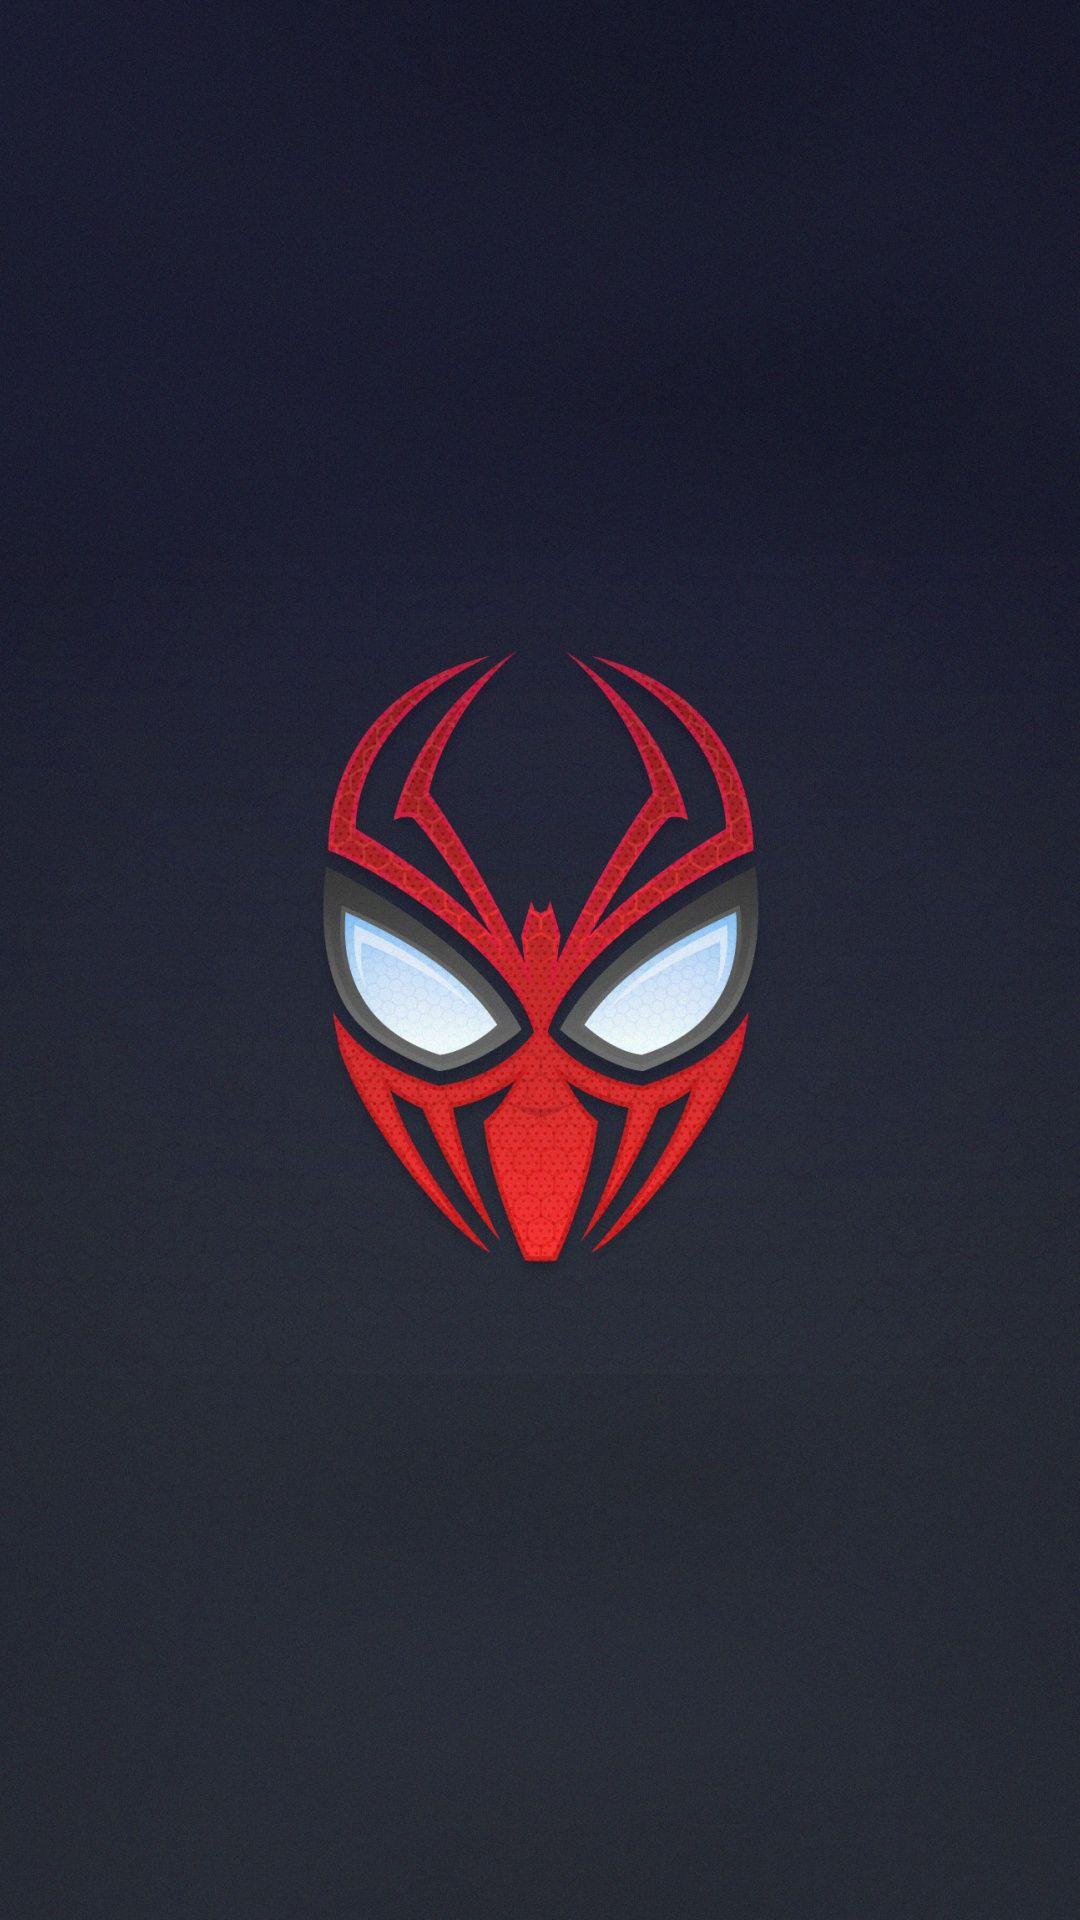 Spider man logo artwork wallpaper Spiderman Marvel spiderman 1080x1920